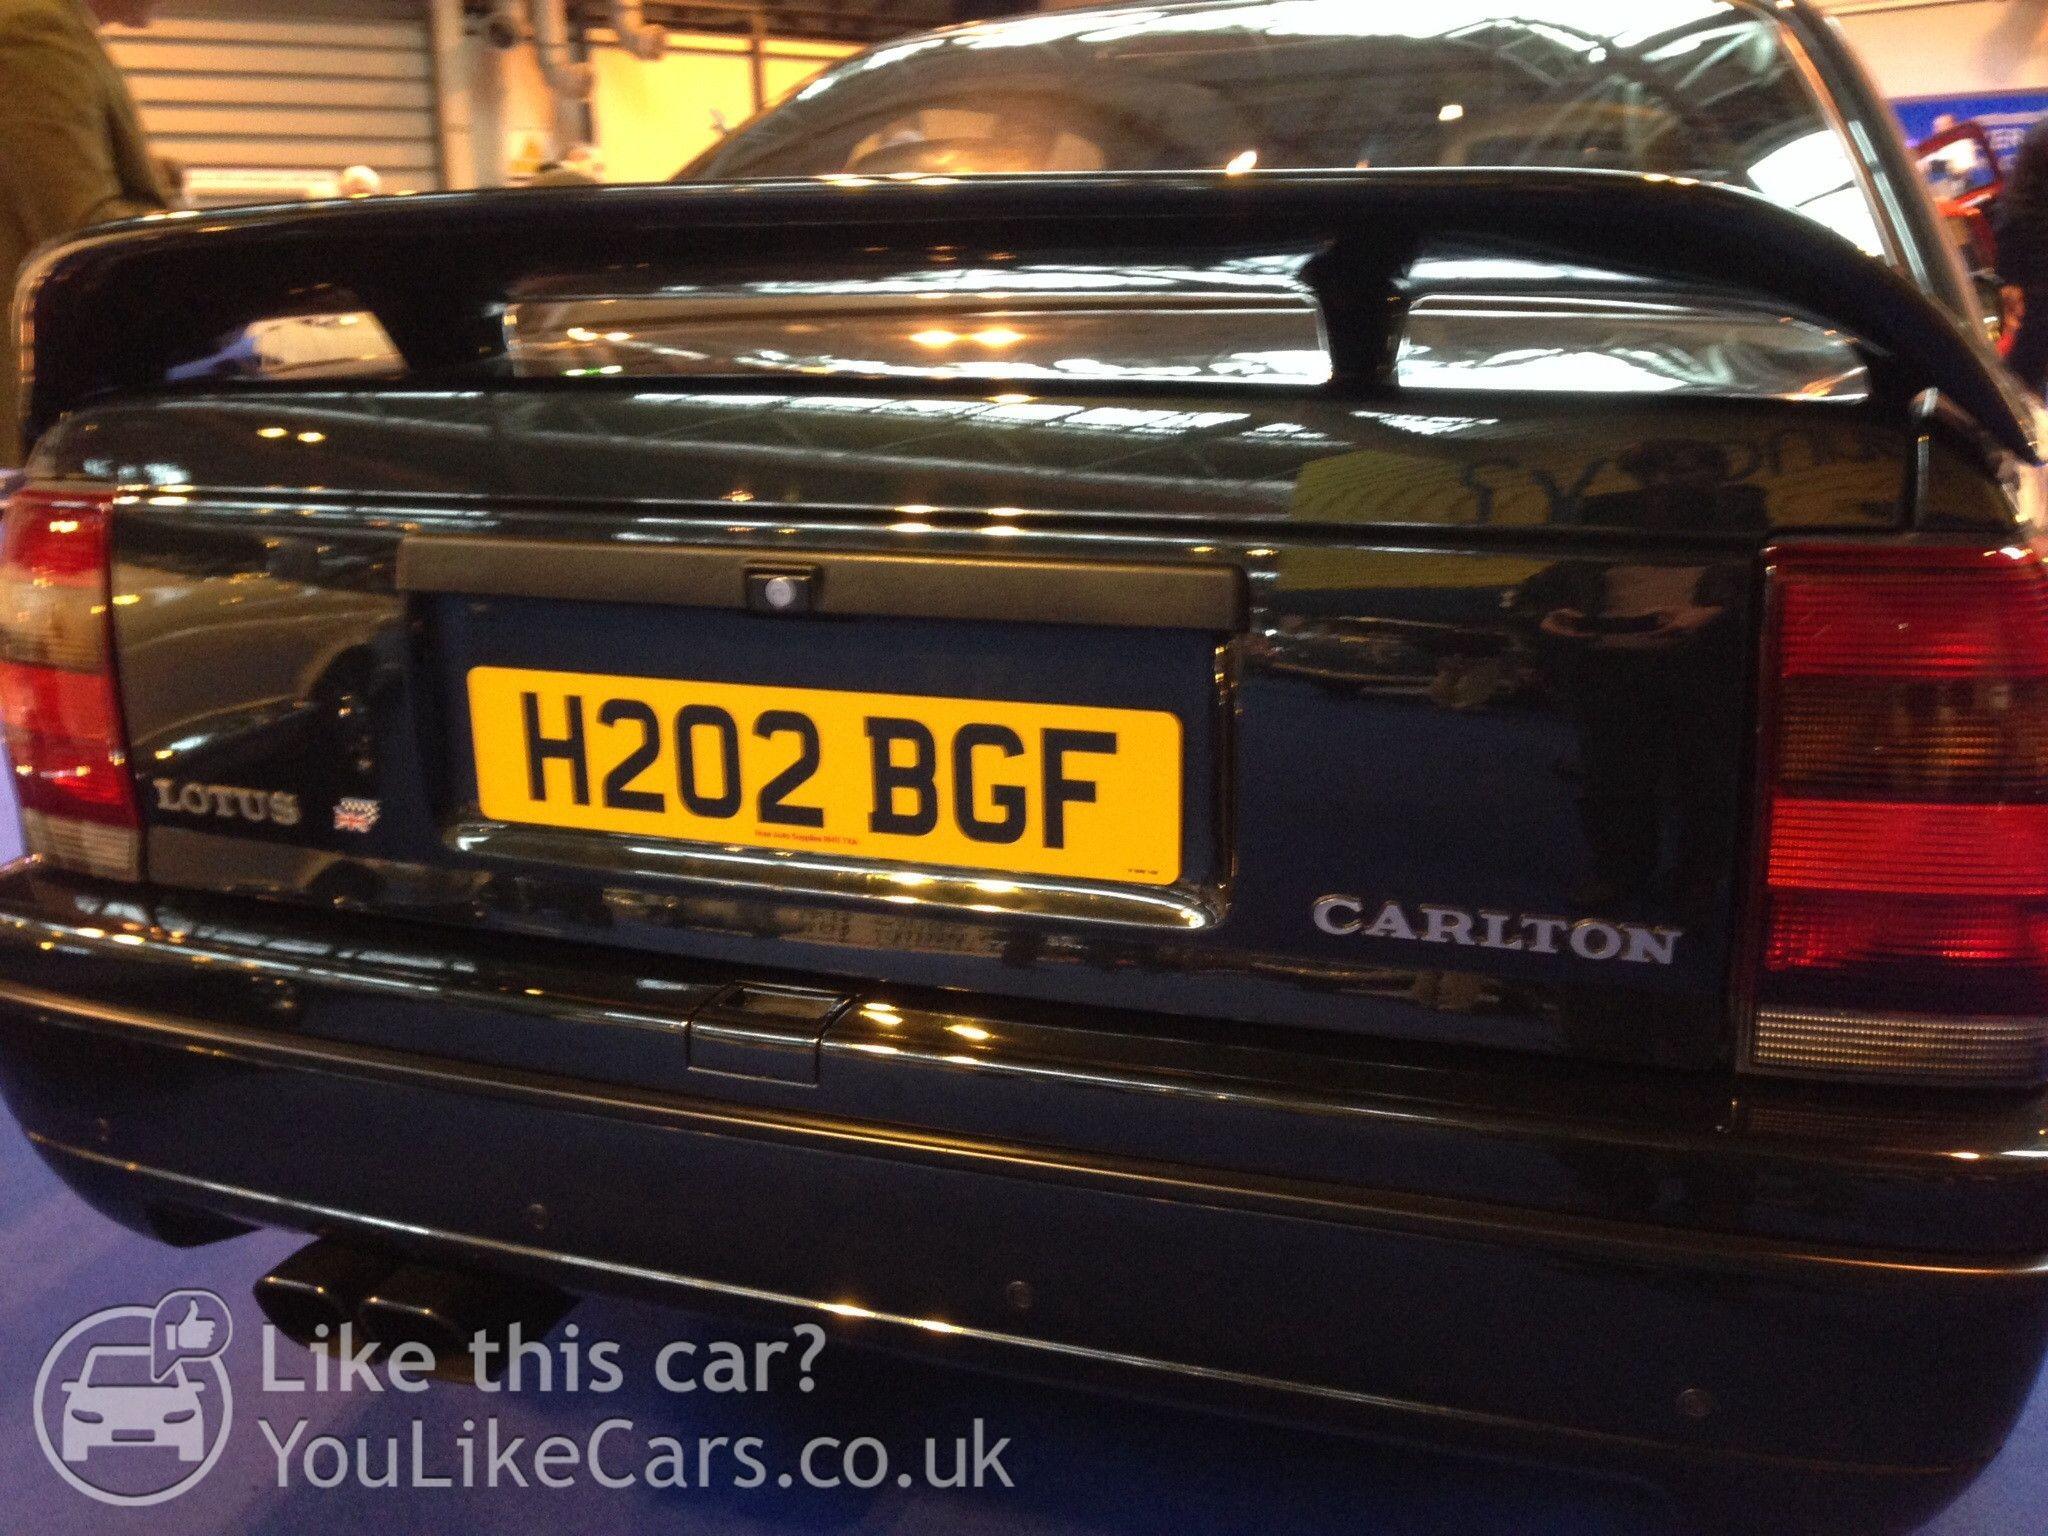 e4229c6461dd5d2f8ea2bbd0a4d332c3 Remarkable Lotus Carlton Body Kit for Sale Cars Trend